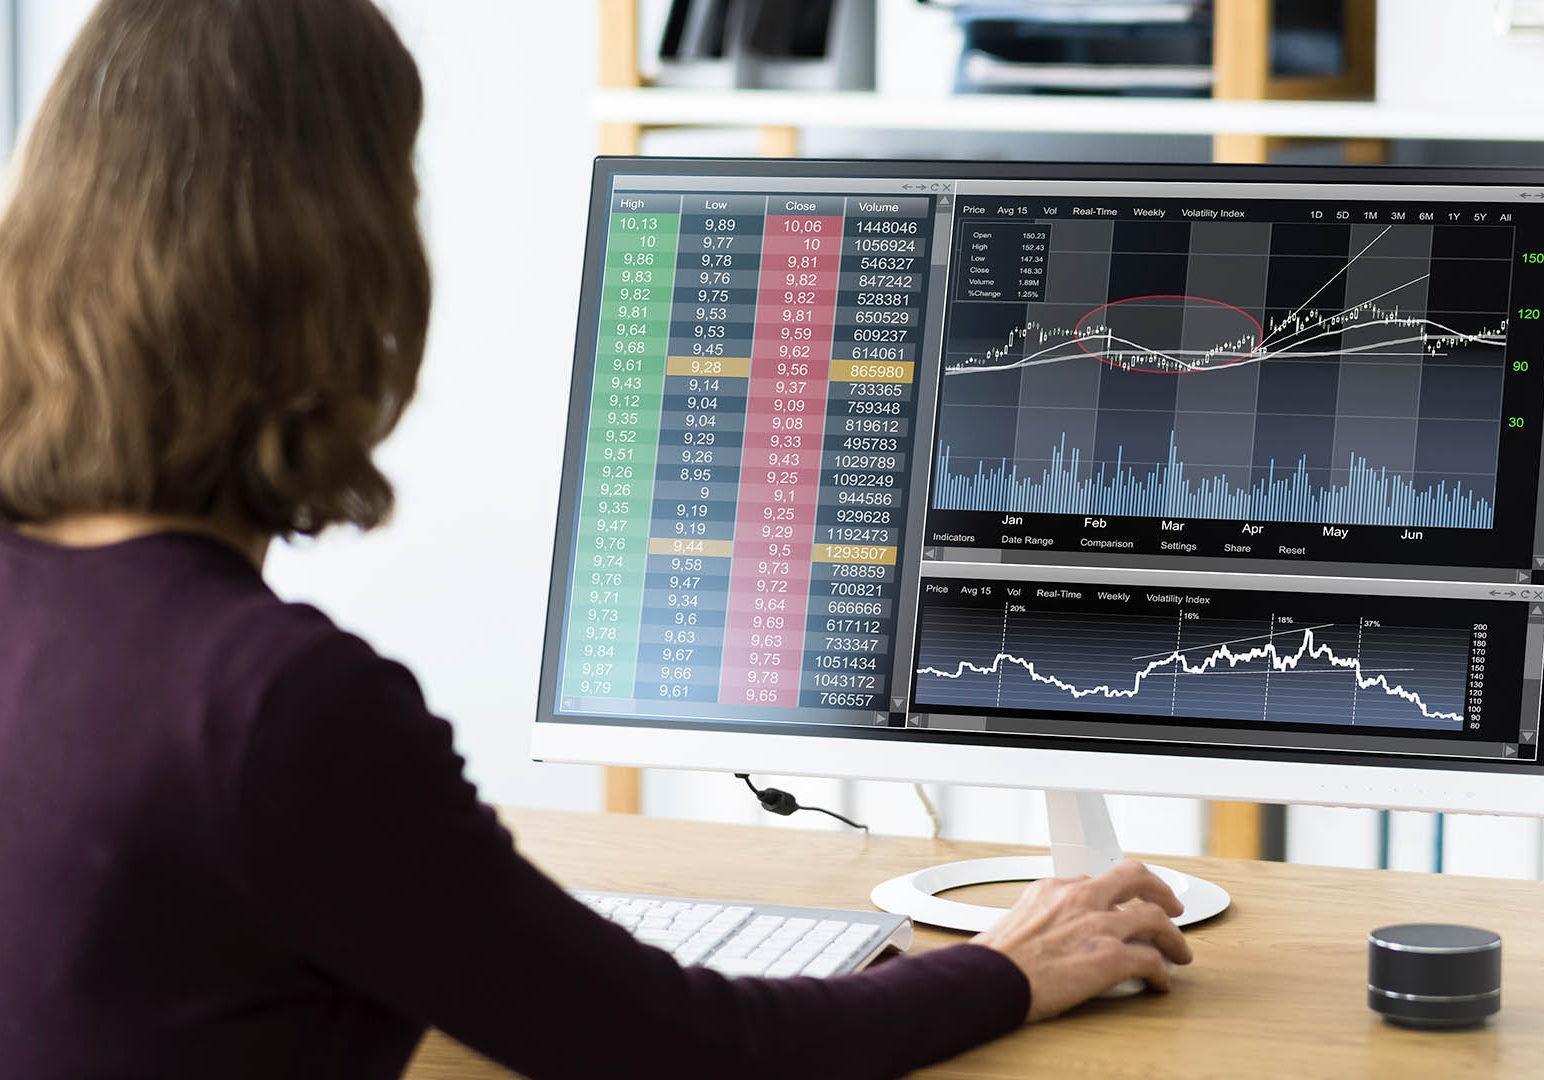 Financial Broker Or Trader Woman At Office Desk